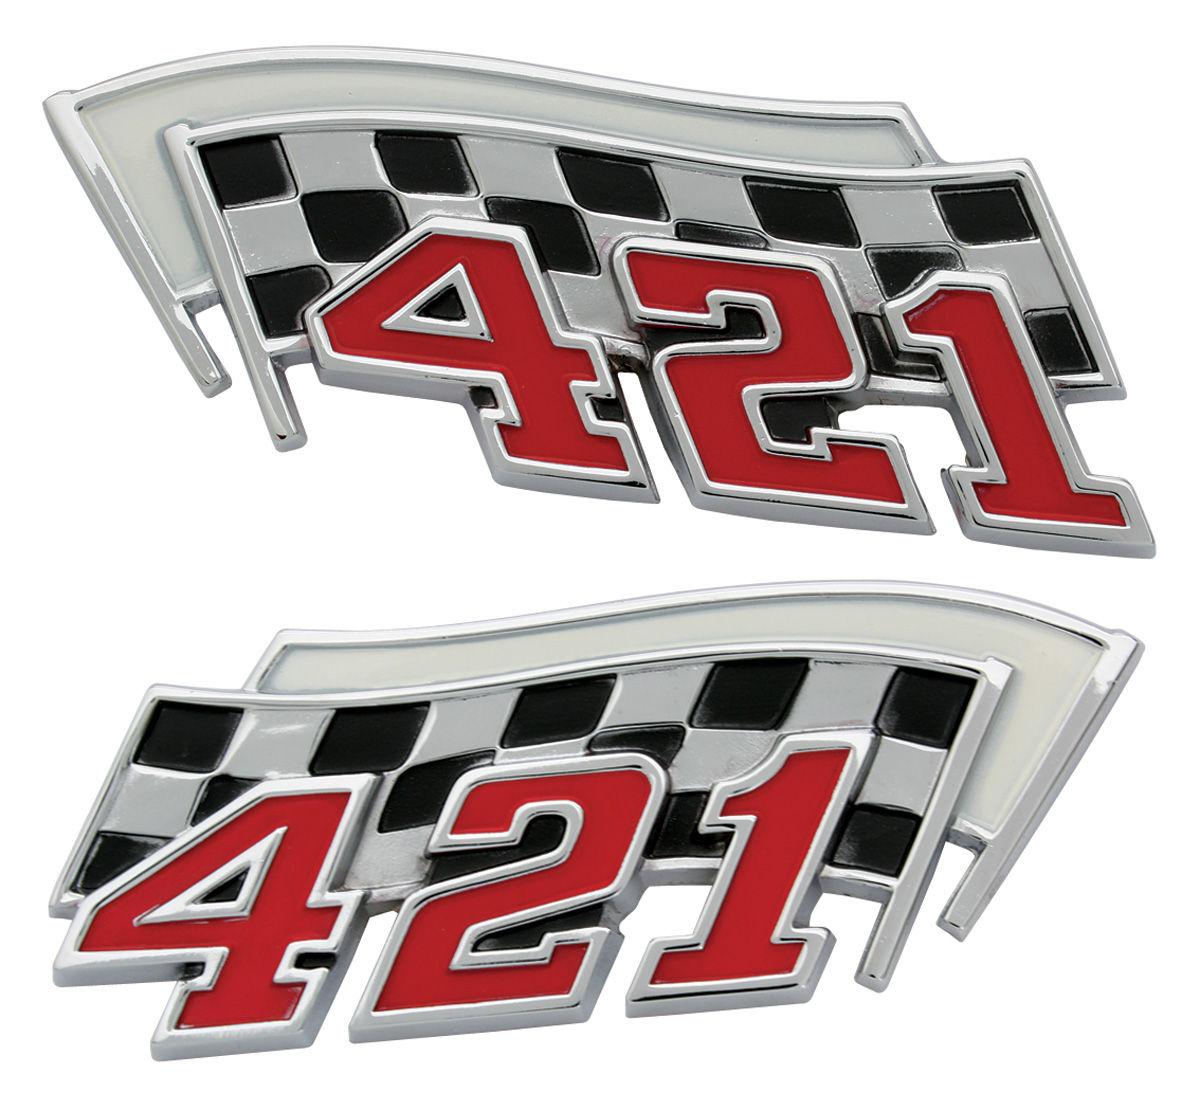 Emblem, Fender, 1962-64 Bonneville/Catalina/Grand Prix, 421